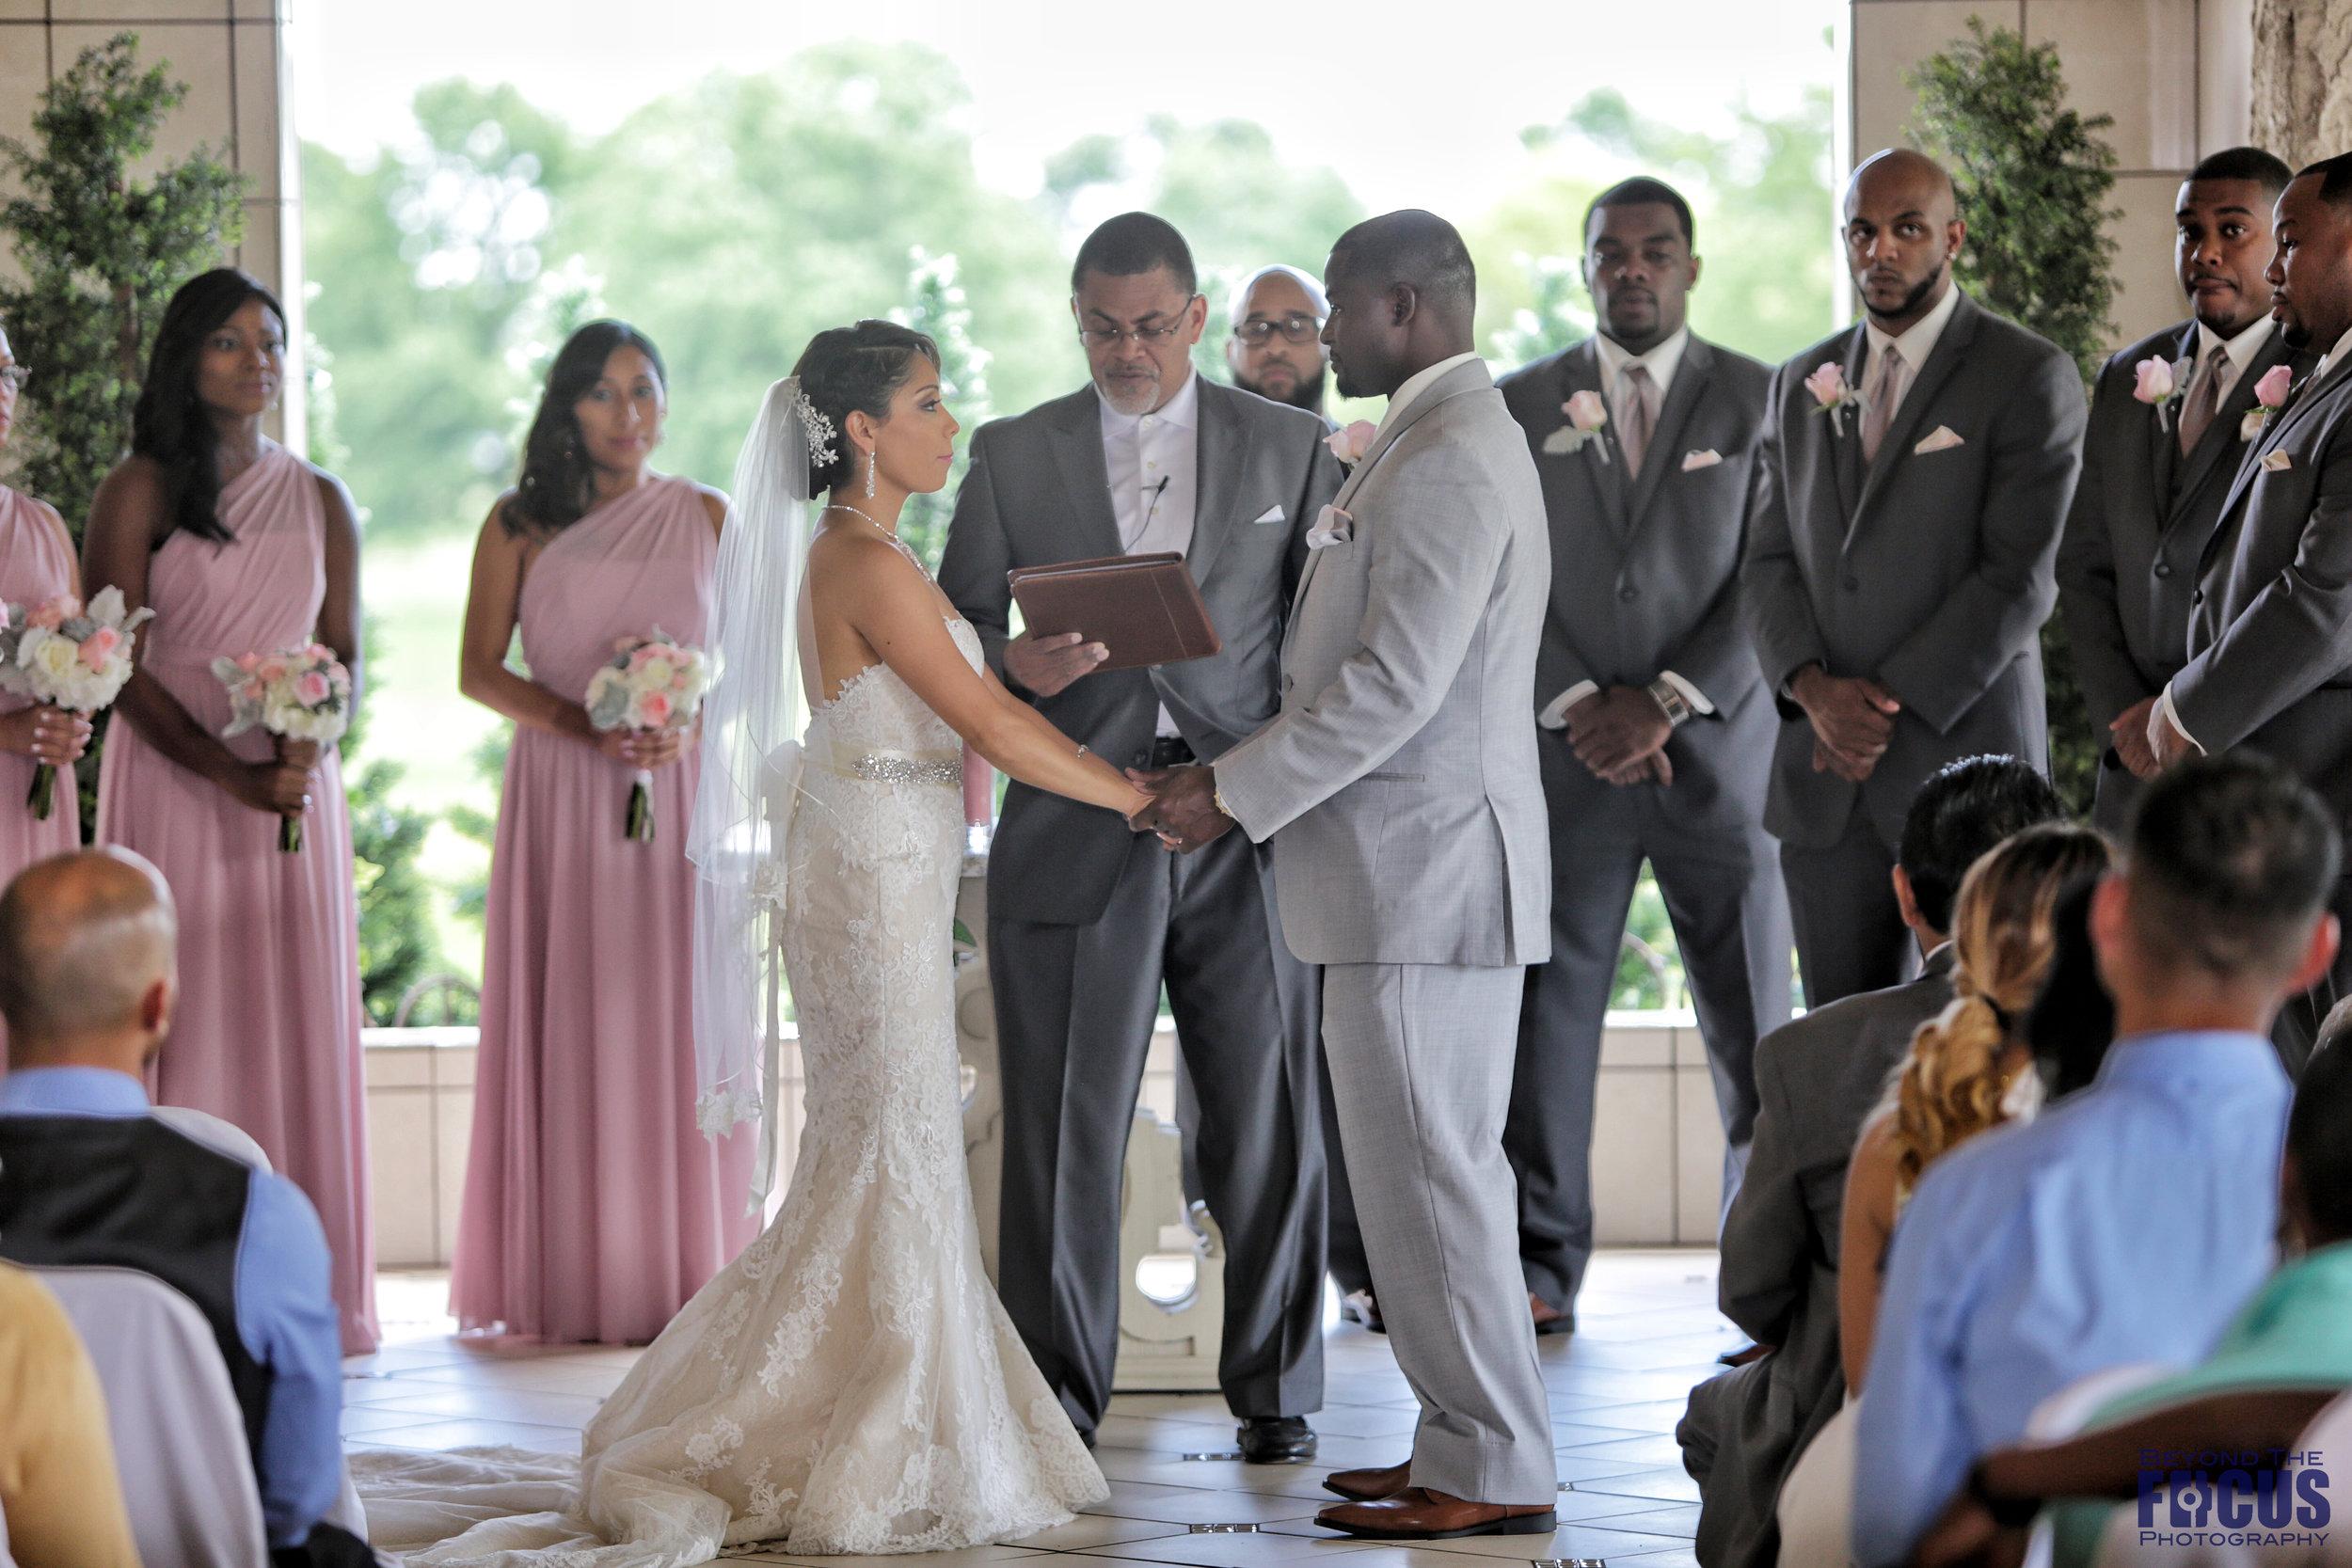 Palmer Wedding - Wedding Ceremony41.jpg